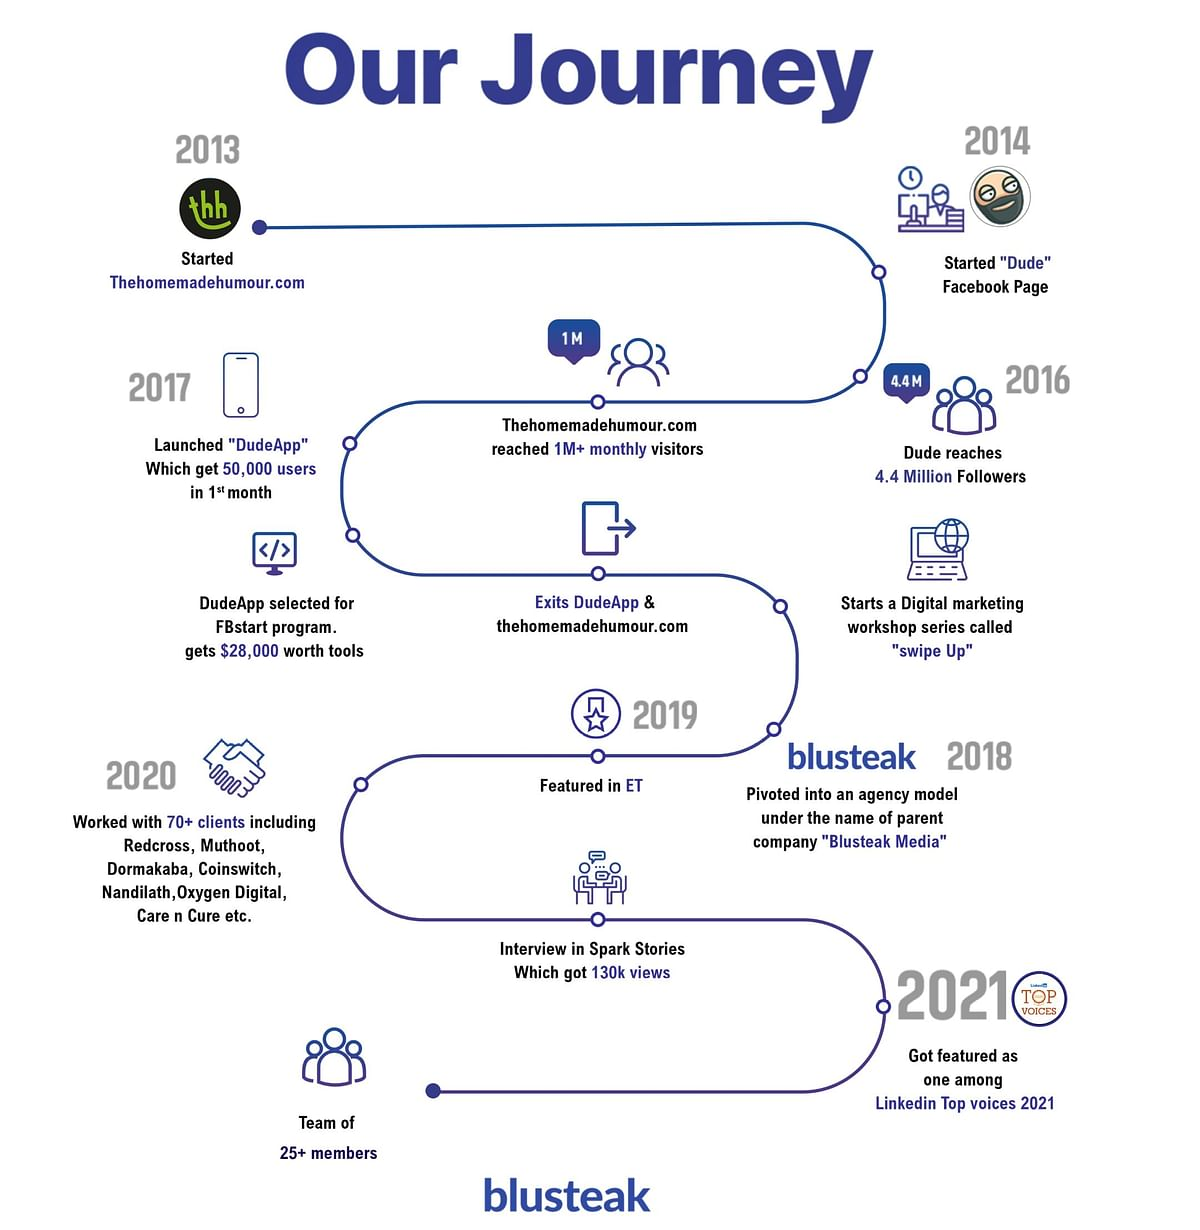 Need good ROAS & Organic Social Media growth? Learn from Blusteak Media's digital marketing efforts